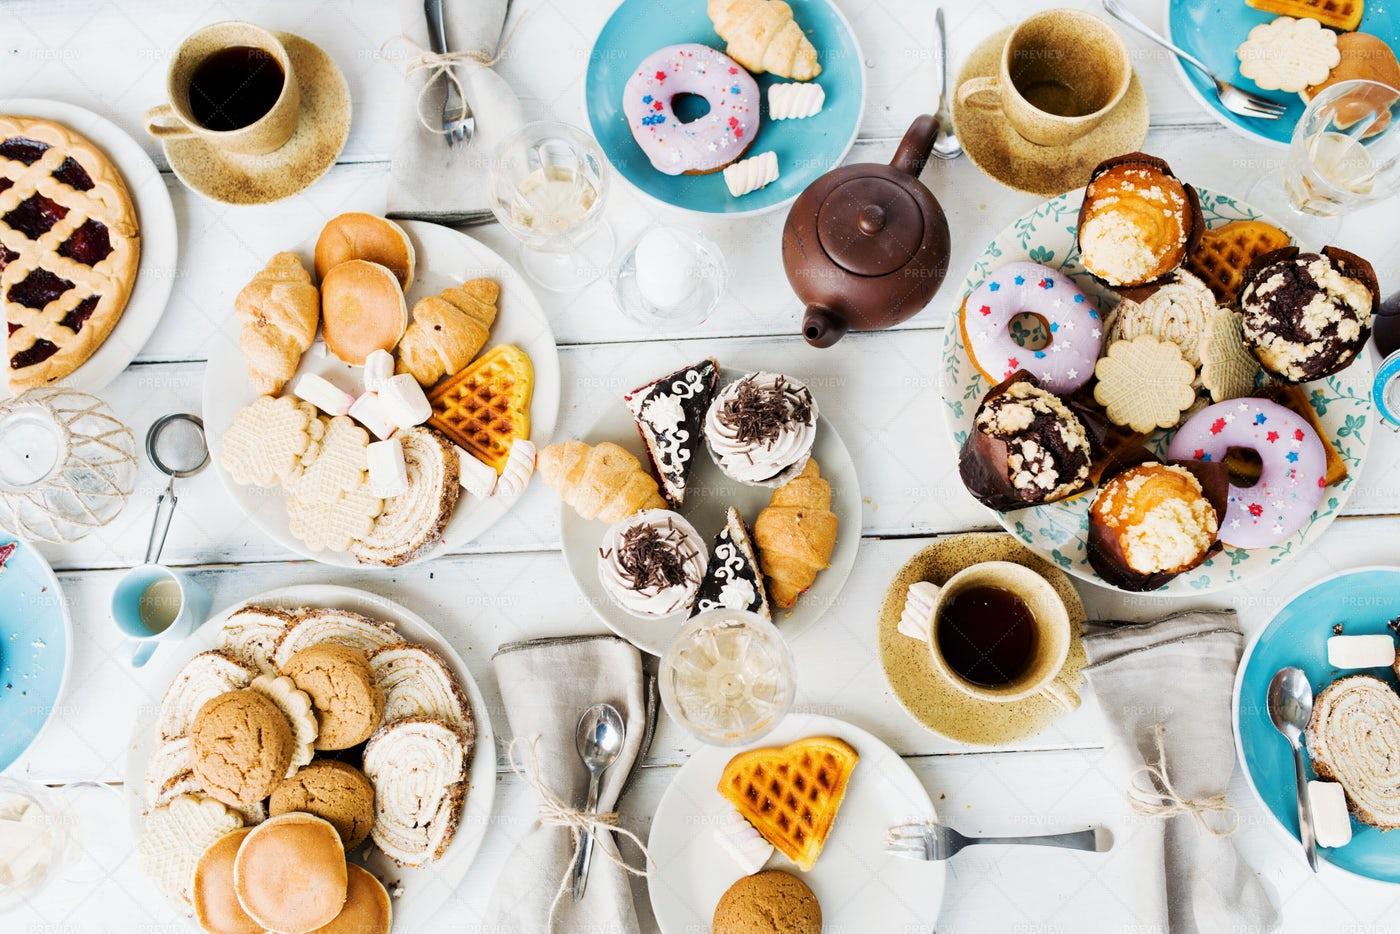 Dessert With Tea: Stock Photos